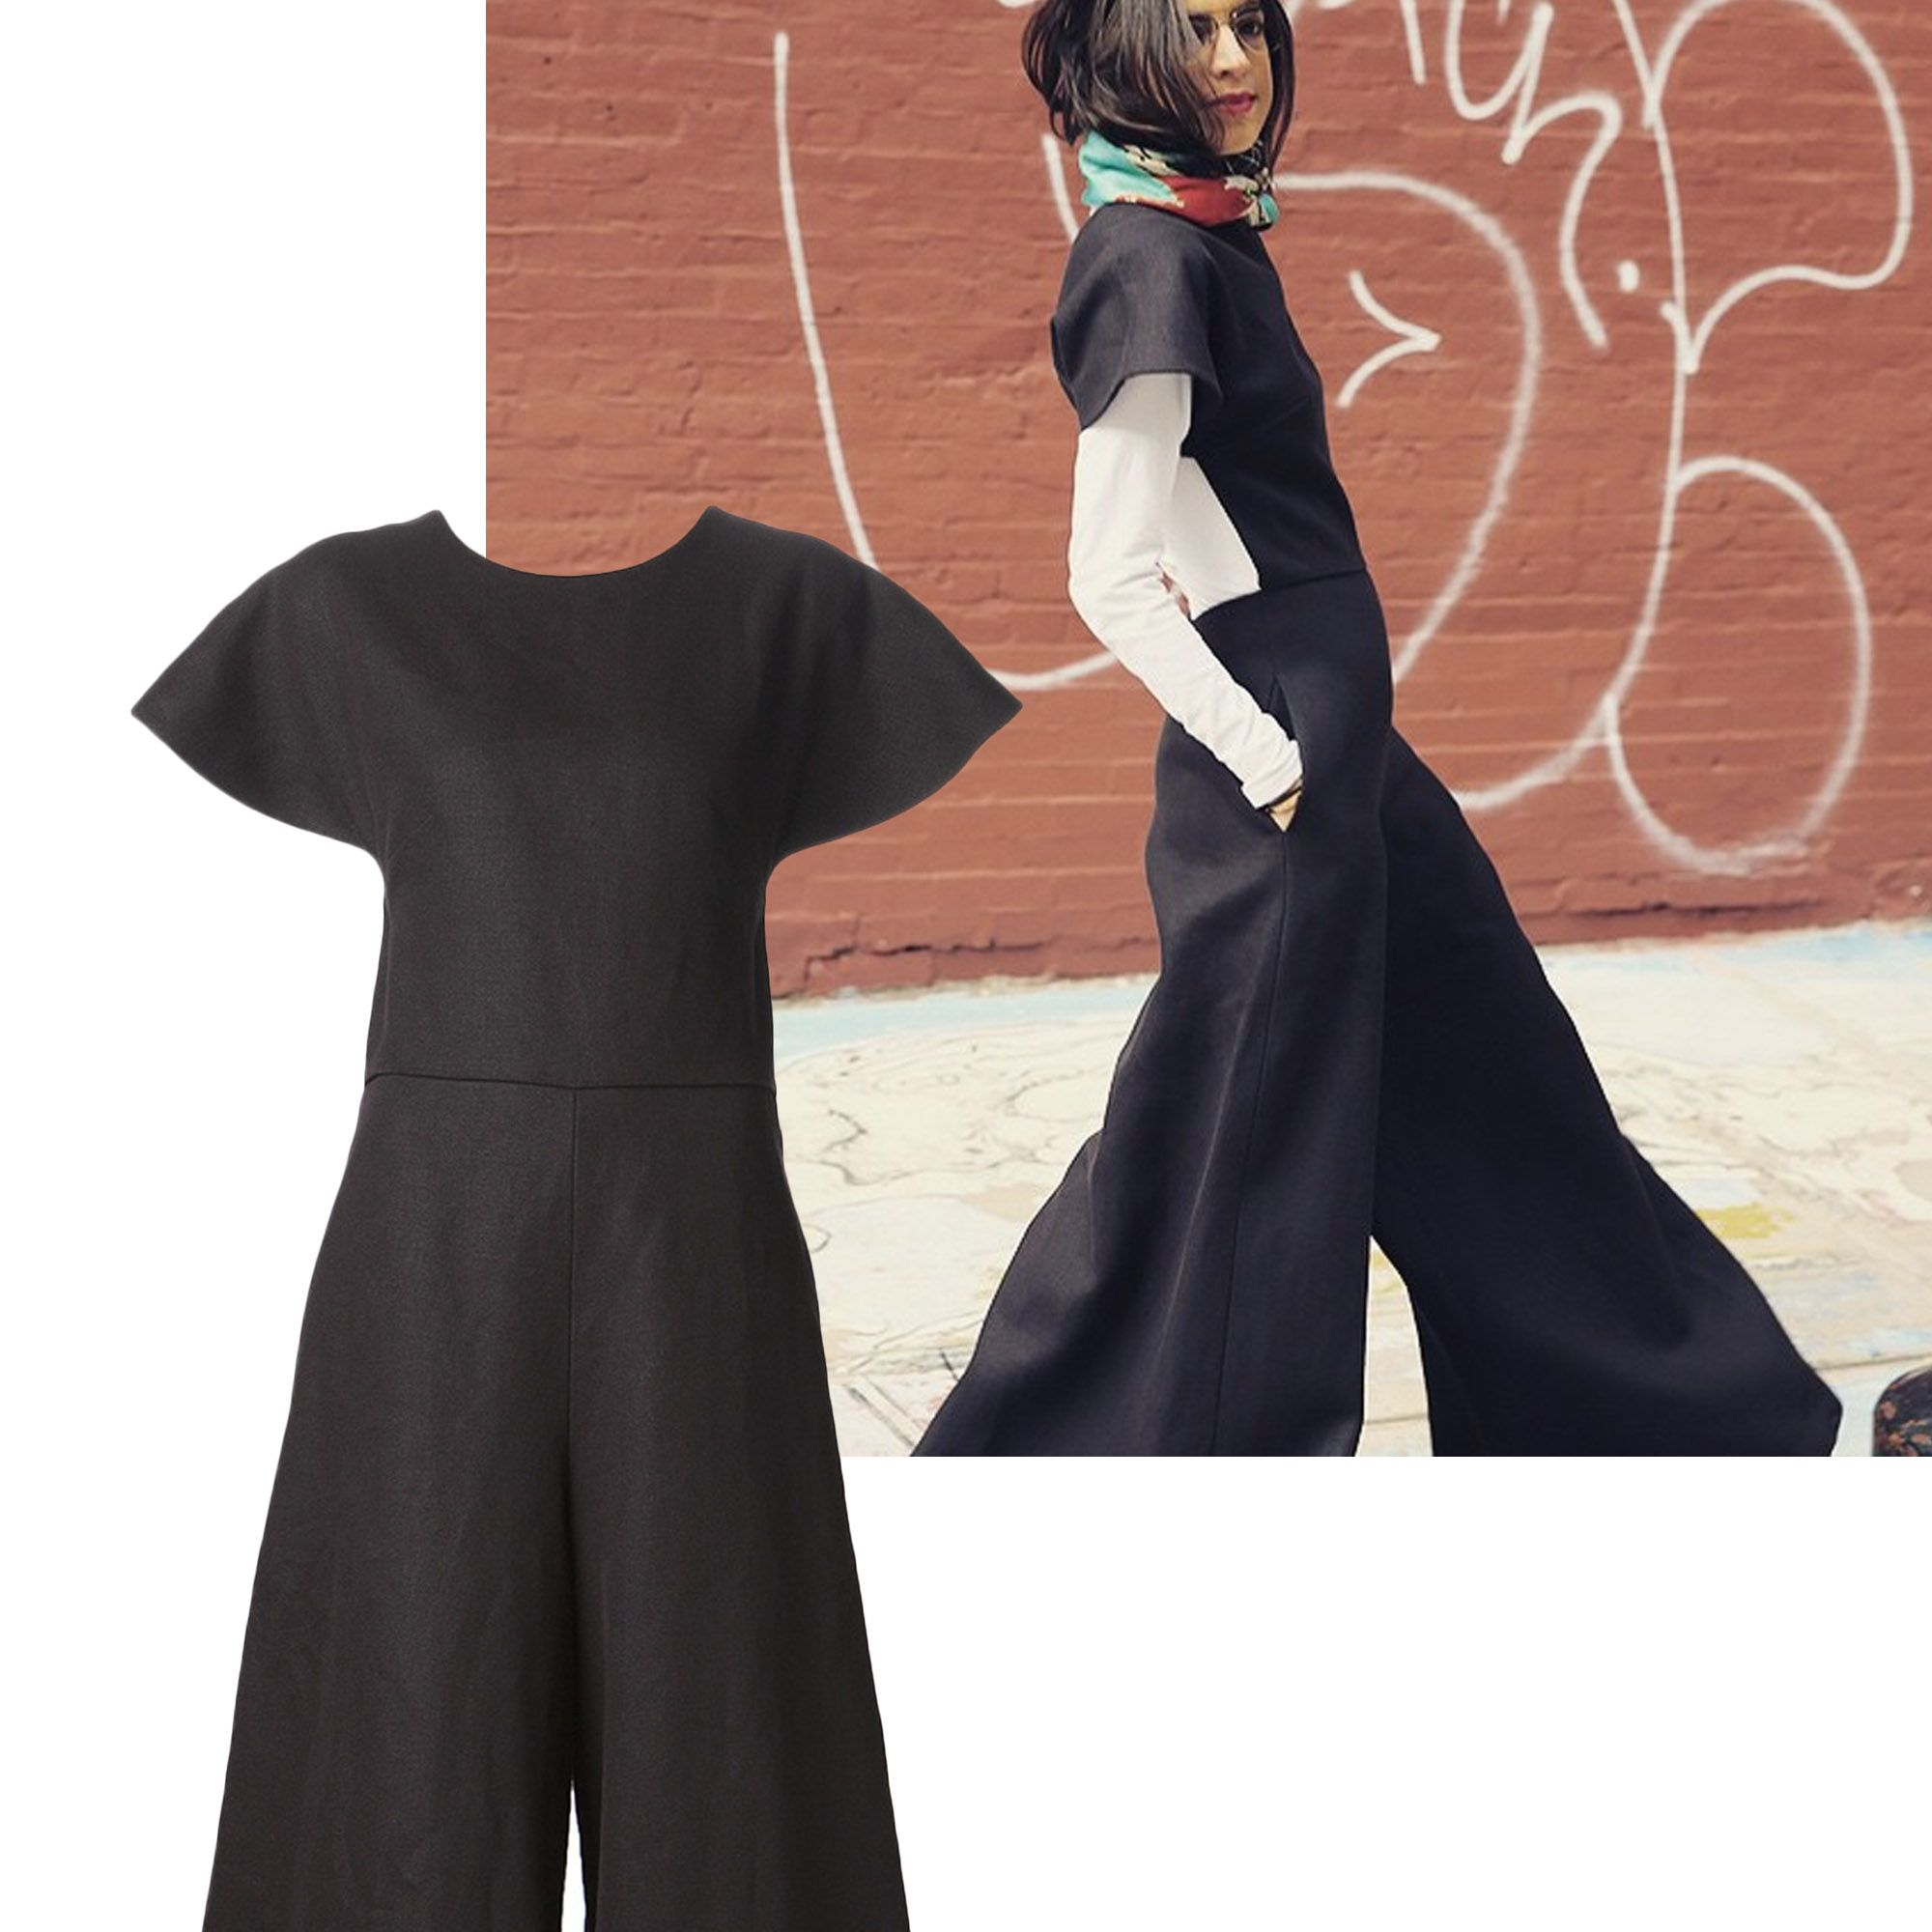 "<a href=""http://instagram.com/manrepeller/"" target=""_blank"">@manrepeller</a><em>Rosie Assoulin dress, $1,995, <a href=""http://shop.harpersbazaar.com/designers/rosie-assoulin/flared-cutout-jumpsuit/"" target=""_blank"">shopBAZAAR.com</a>.</em>"